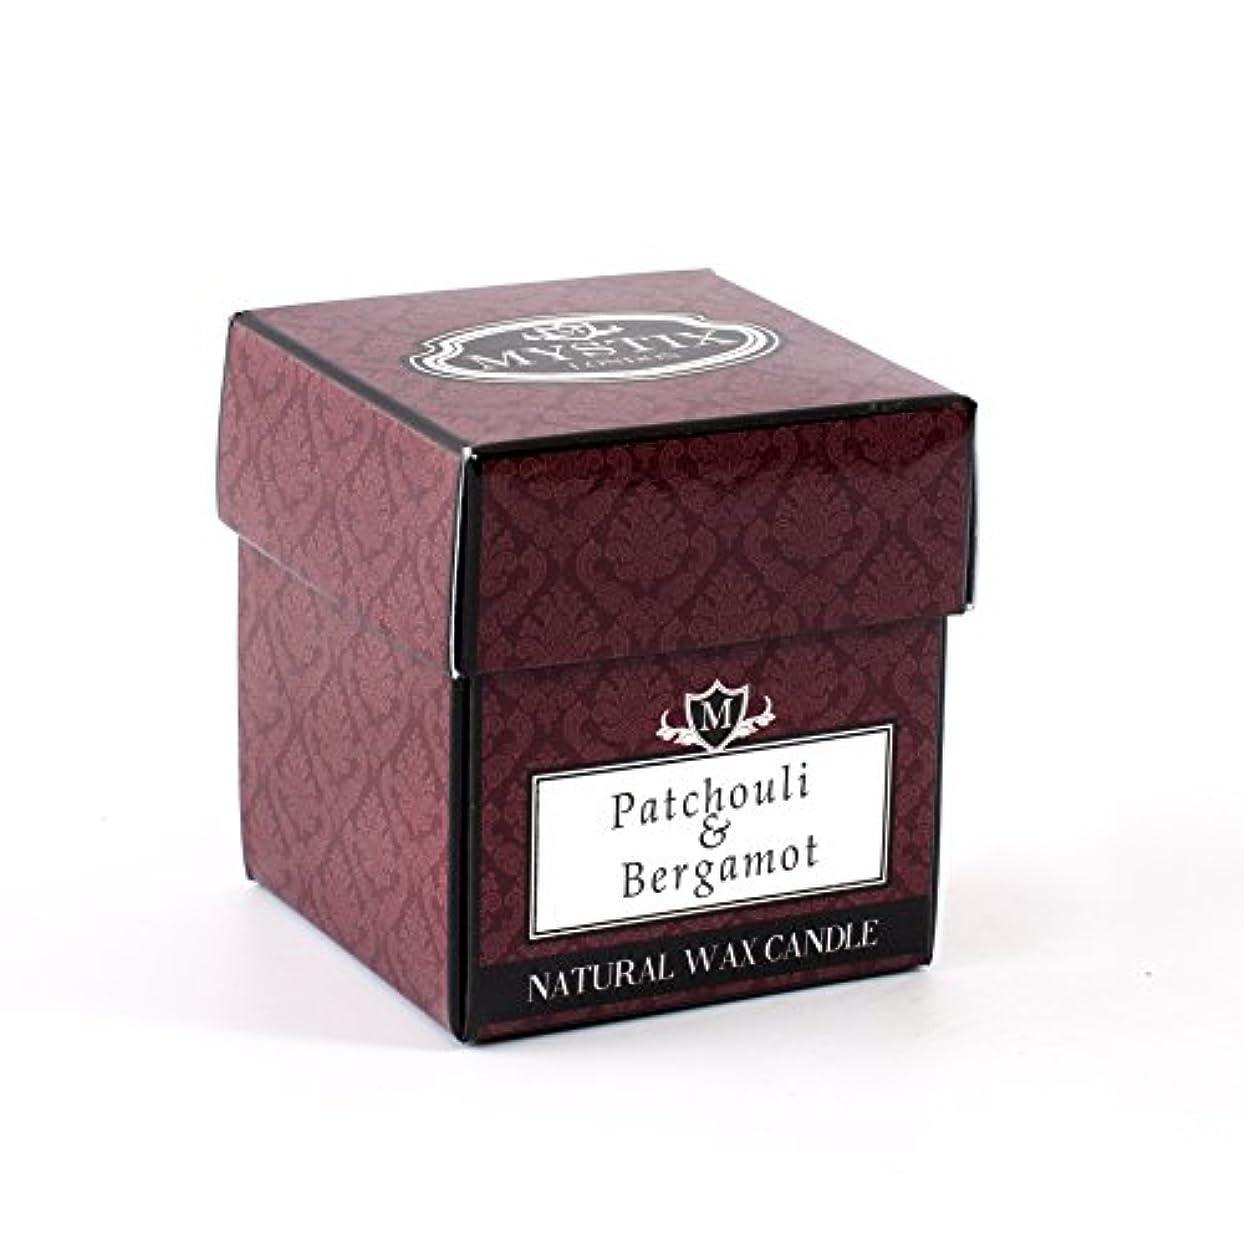 Mystix London | Patchouli & Bergamot Scented Candle x 5